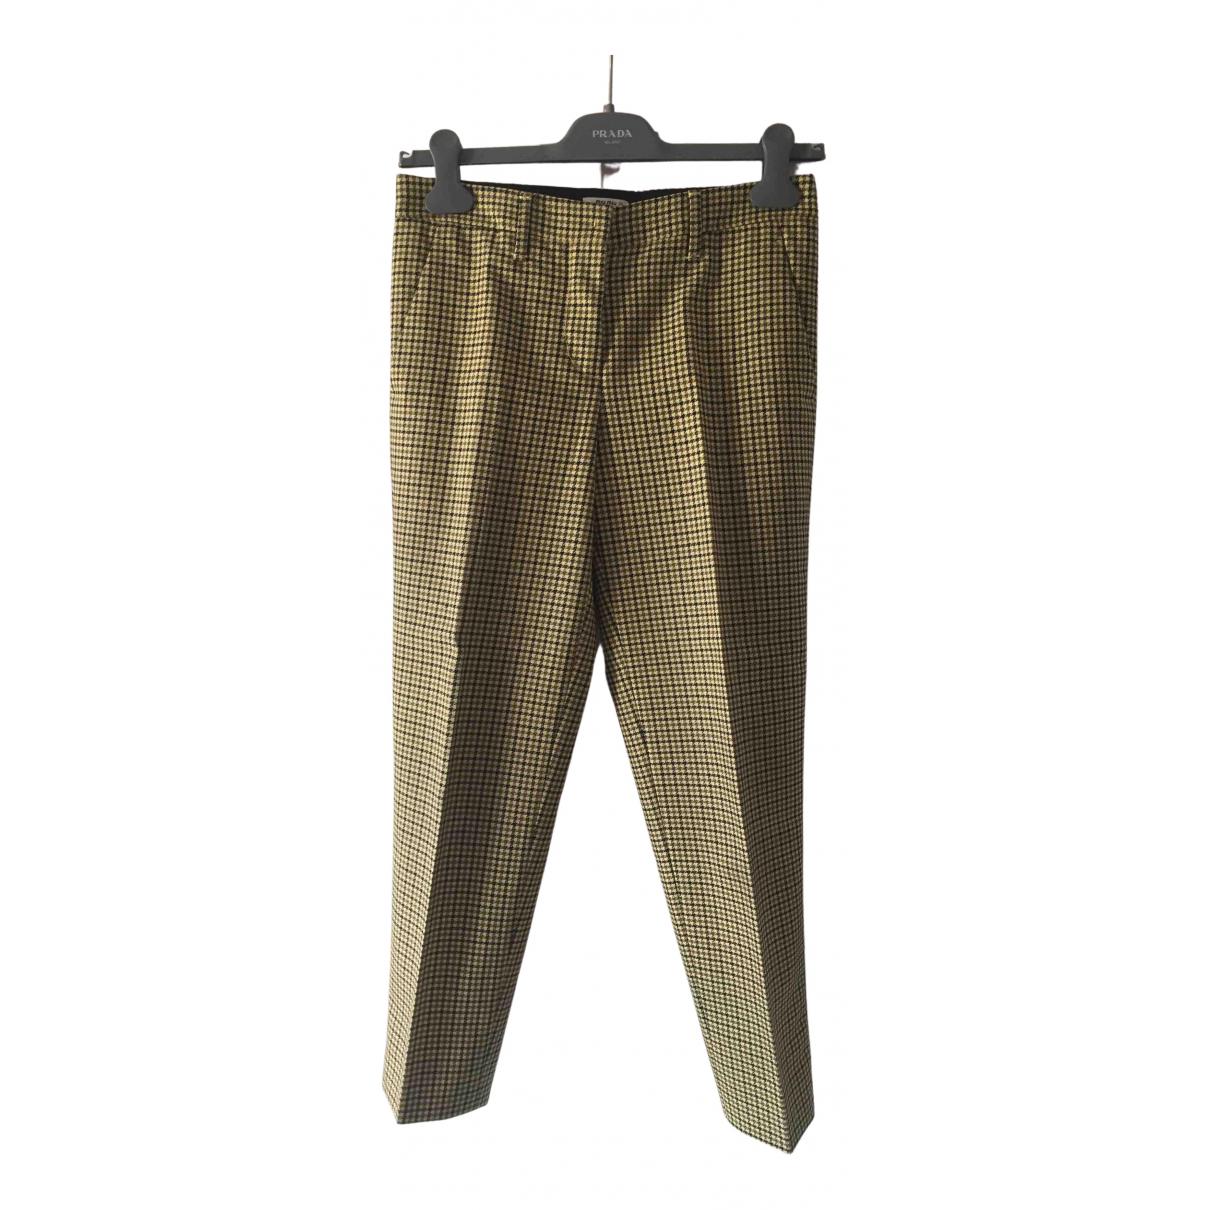 Miu Miu N Multicolour Wool Trousers for Women 36 IT